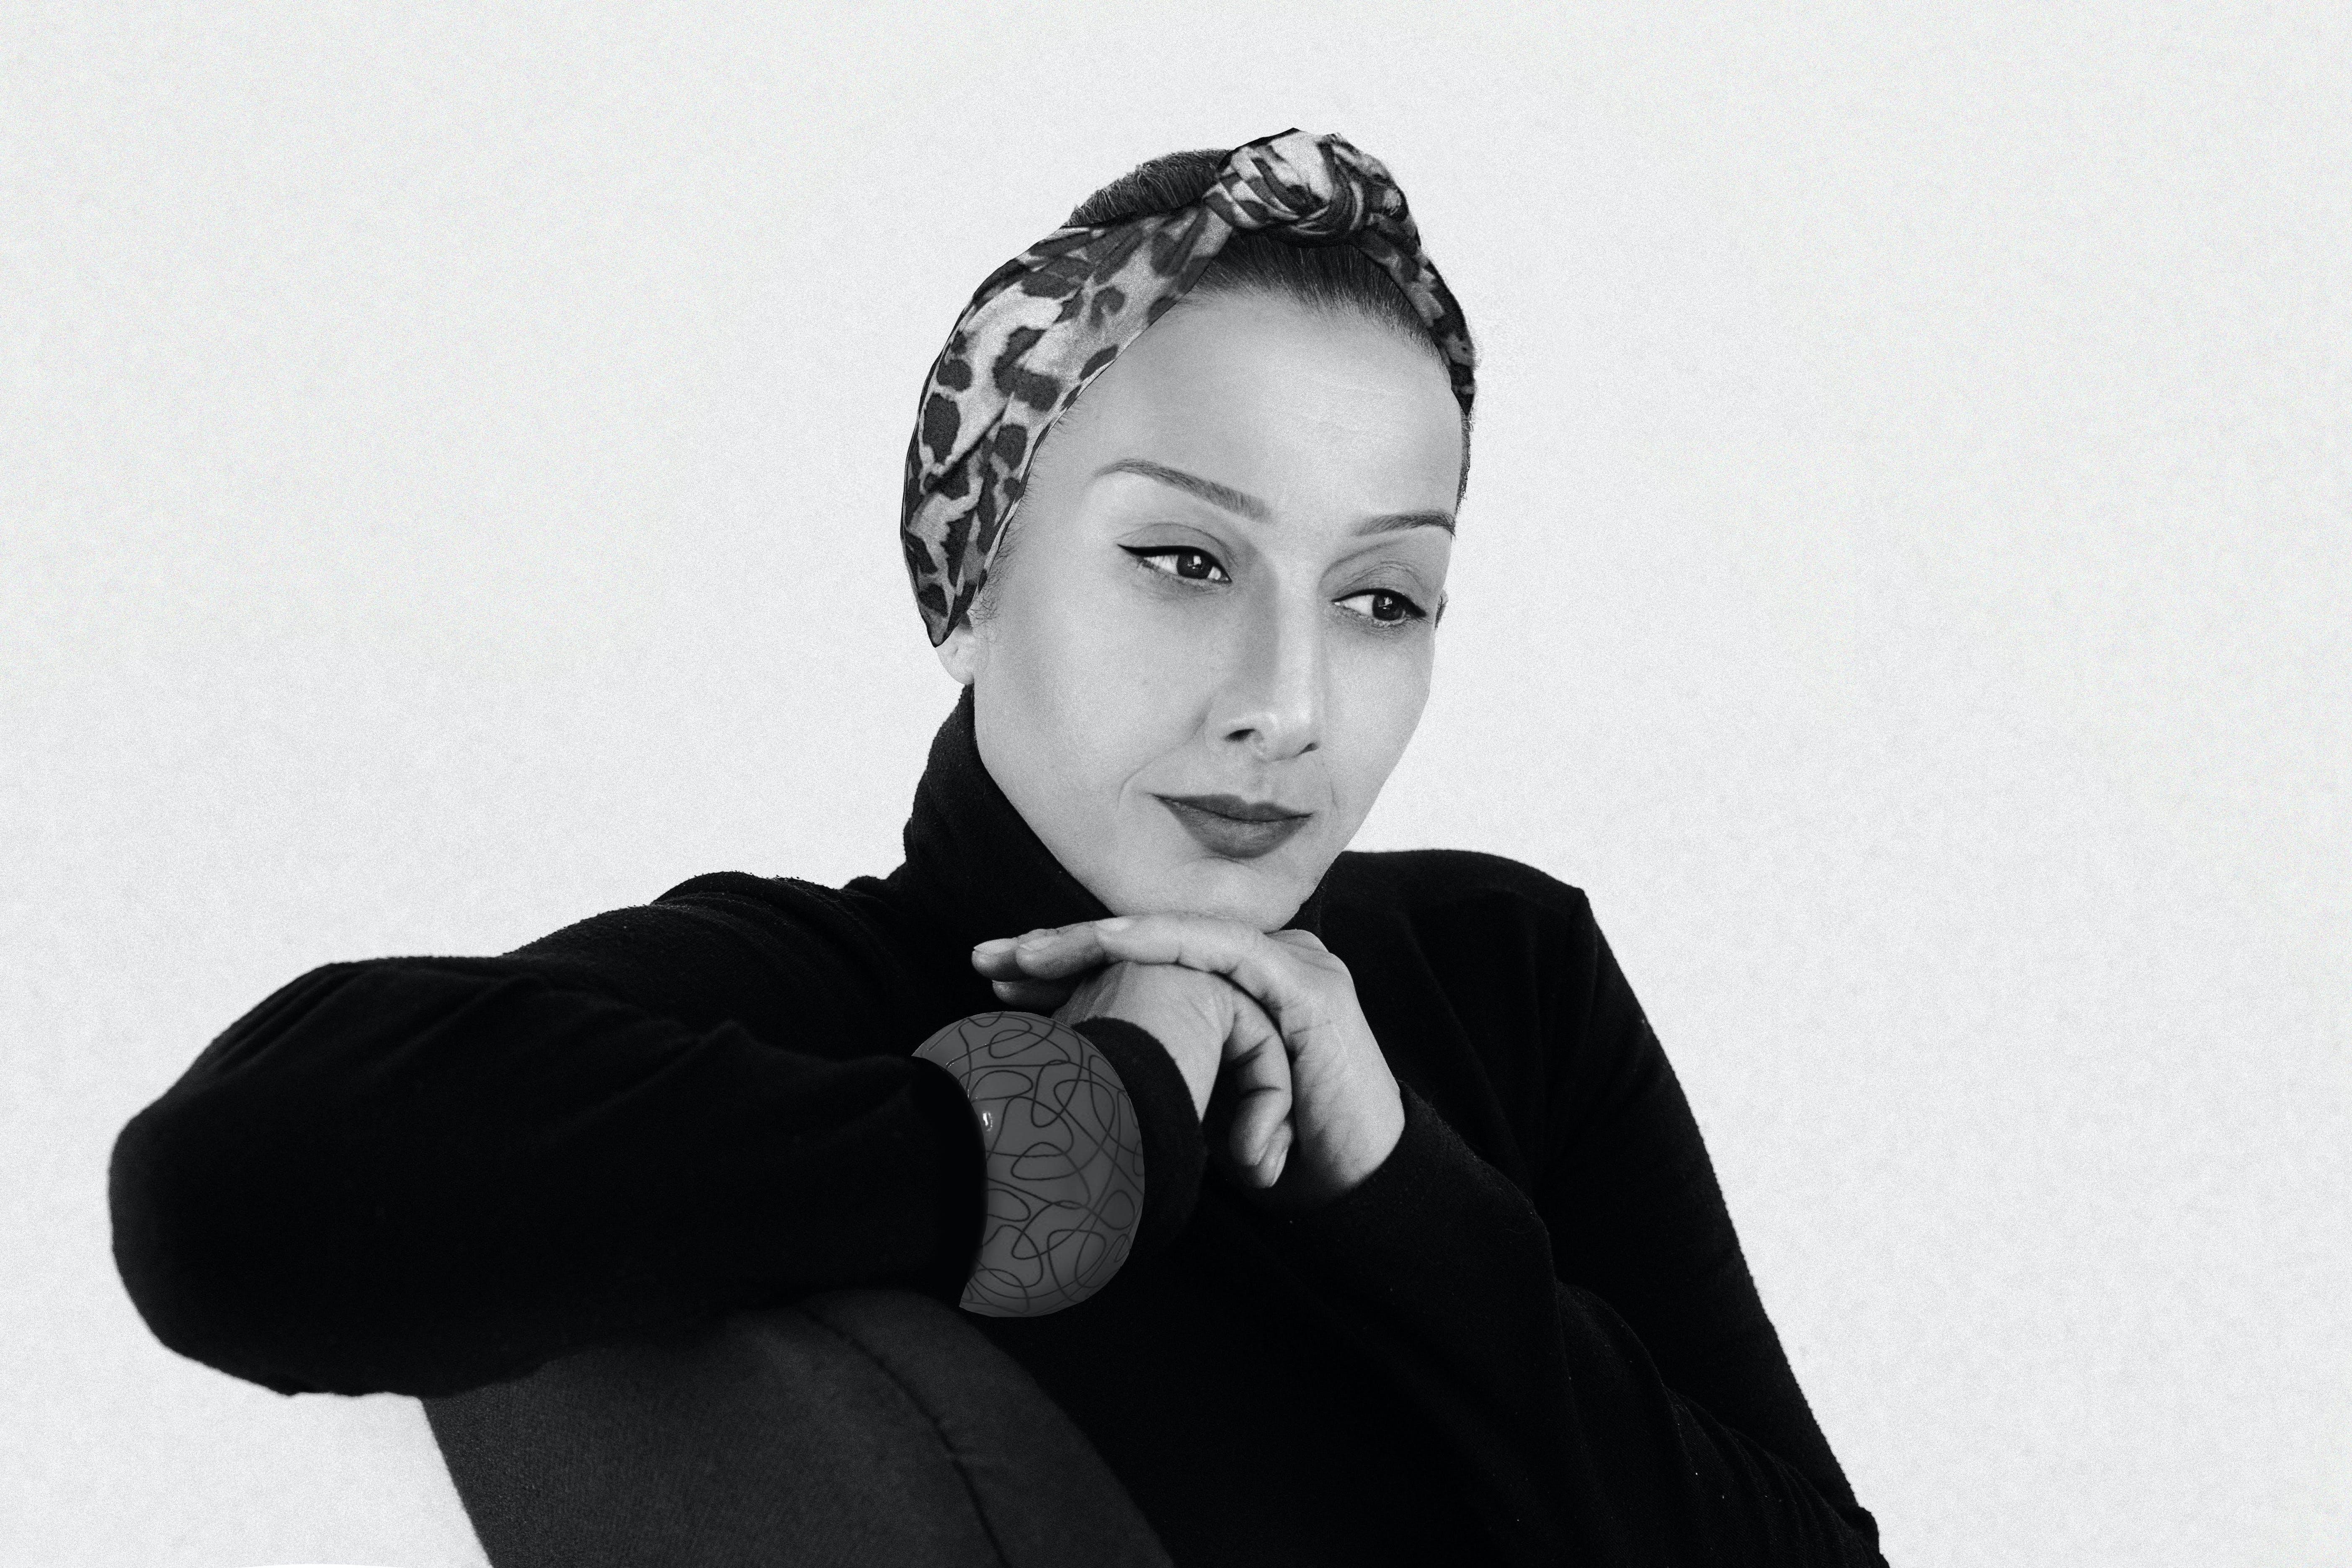 Grayscale Portrait of Woman